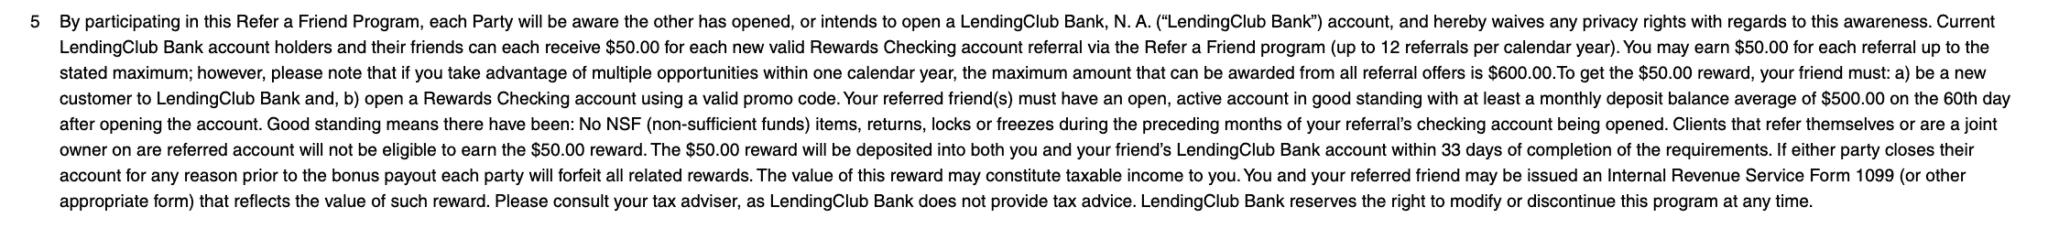 radius bank referral terms